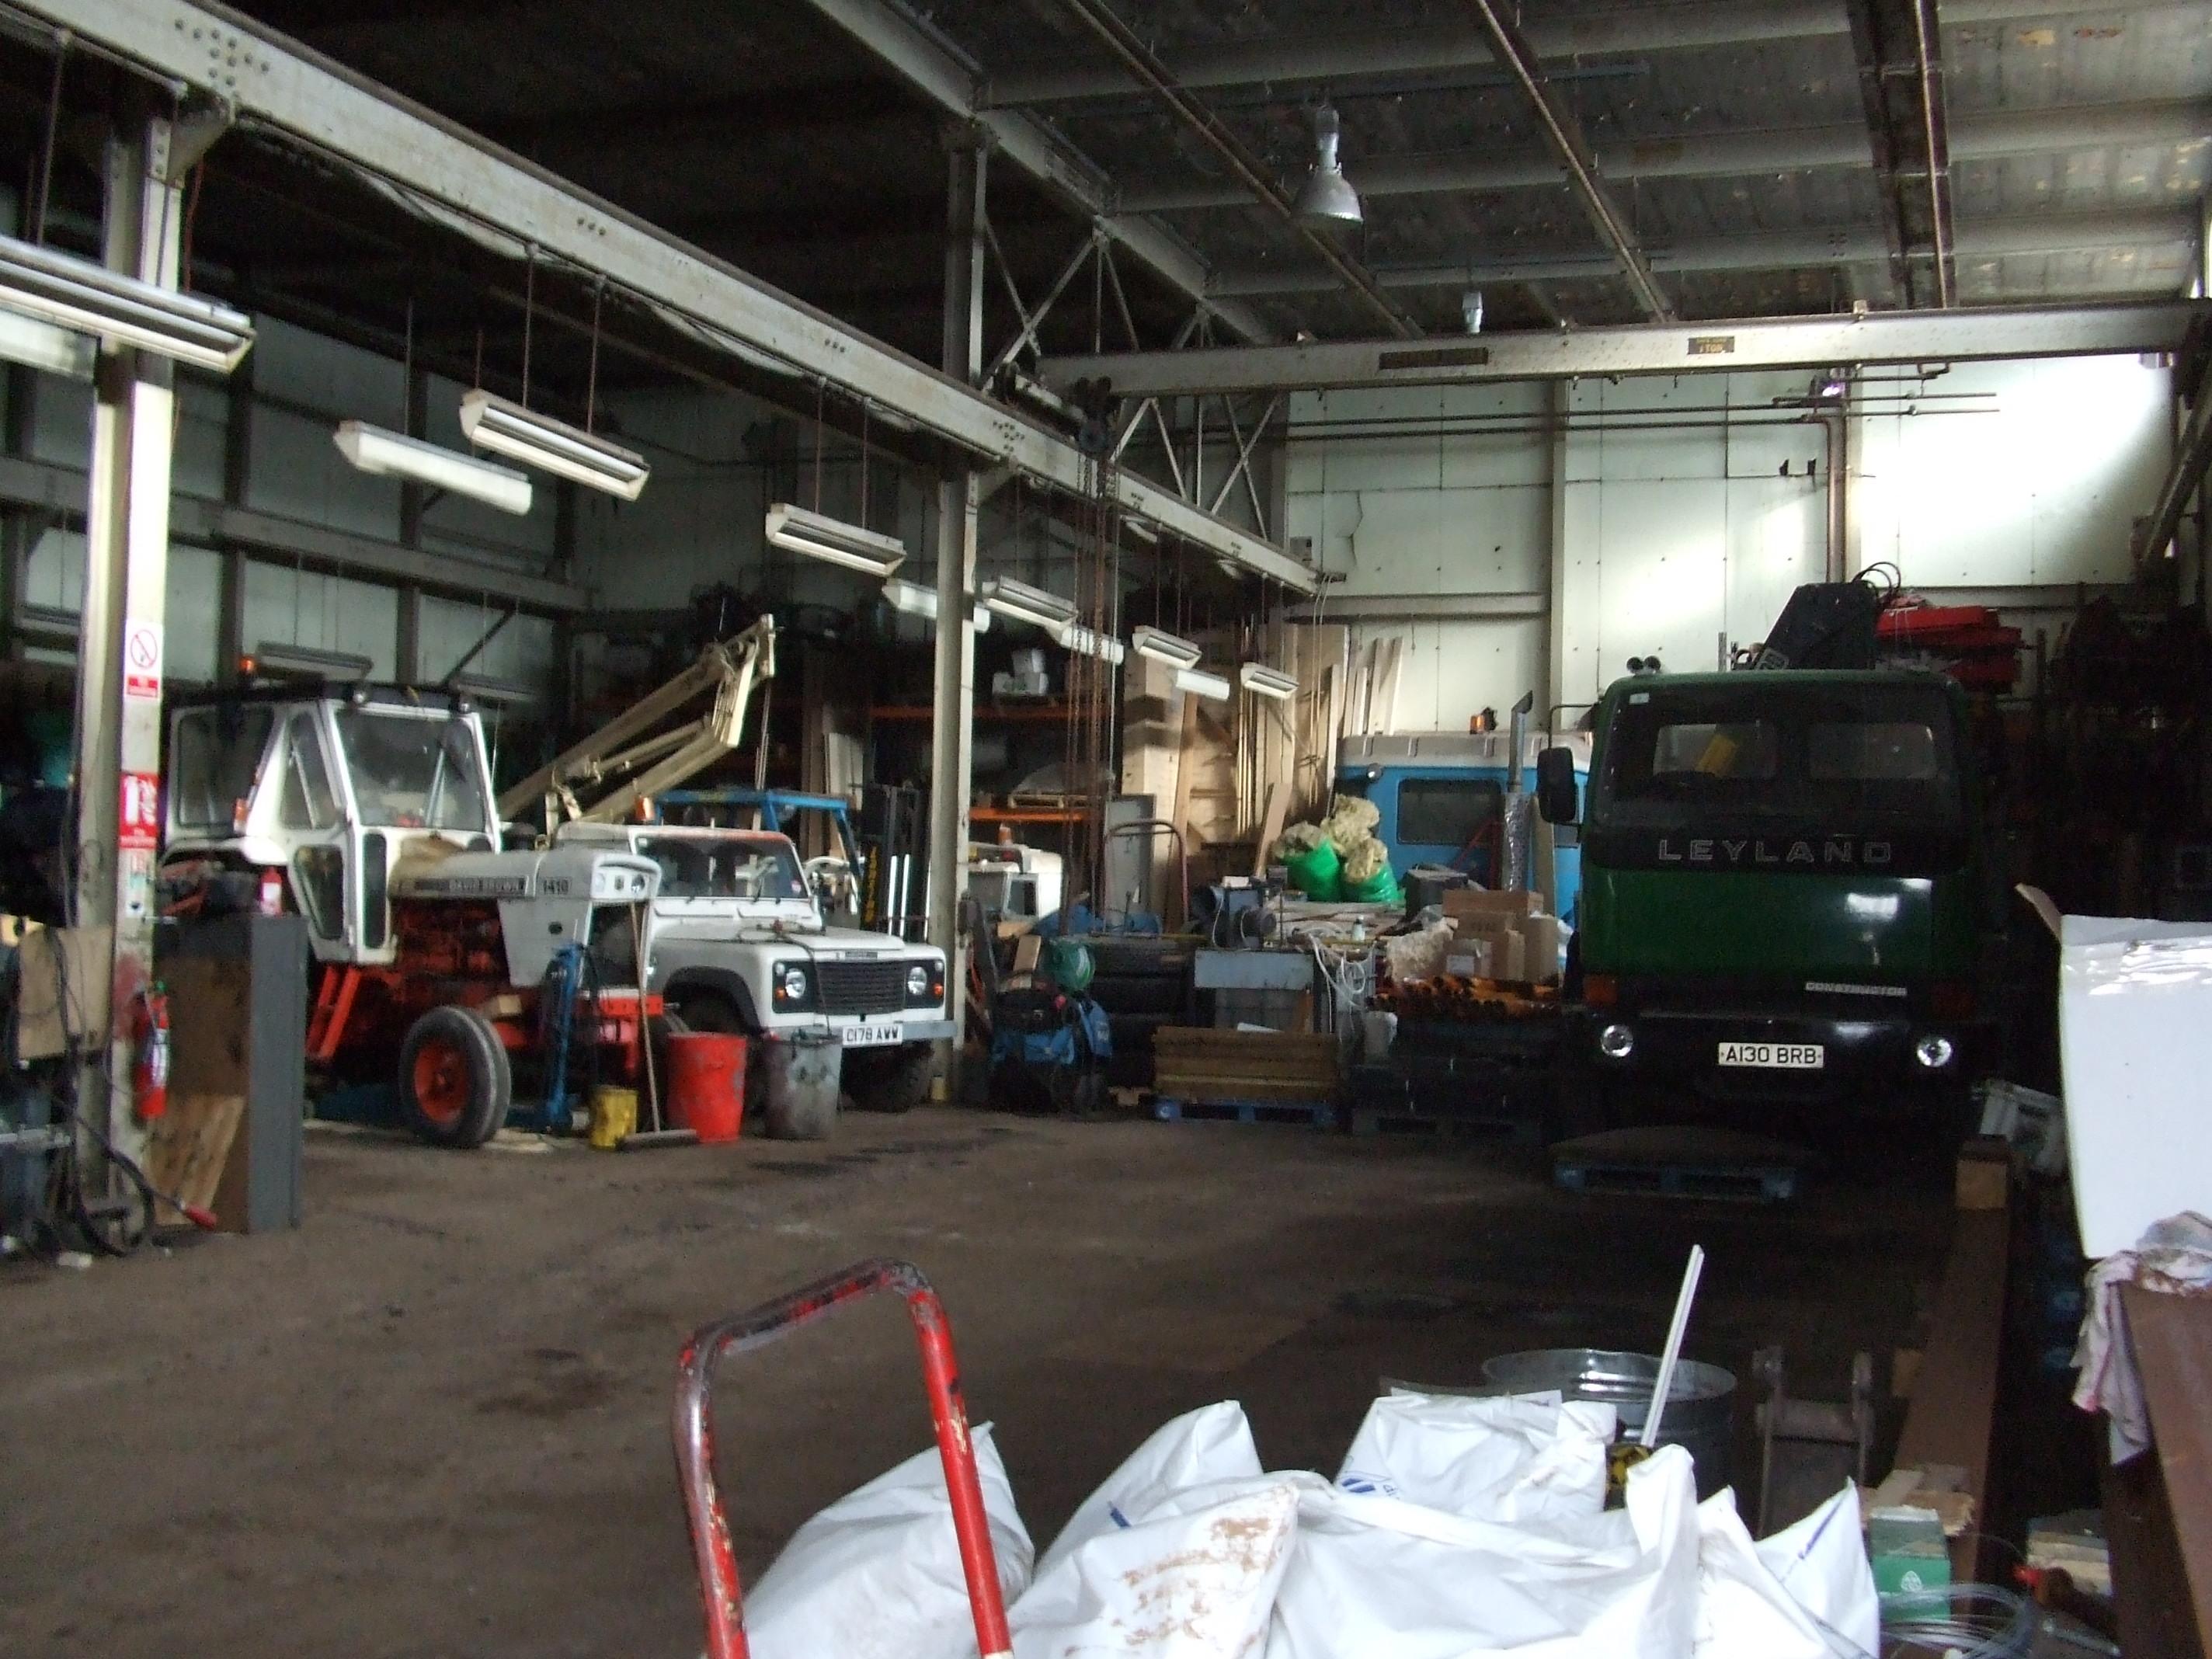 Warehouse Vehicles Market in 360MarketUpdates.com